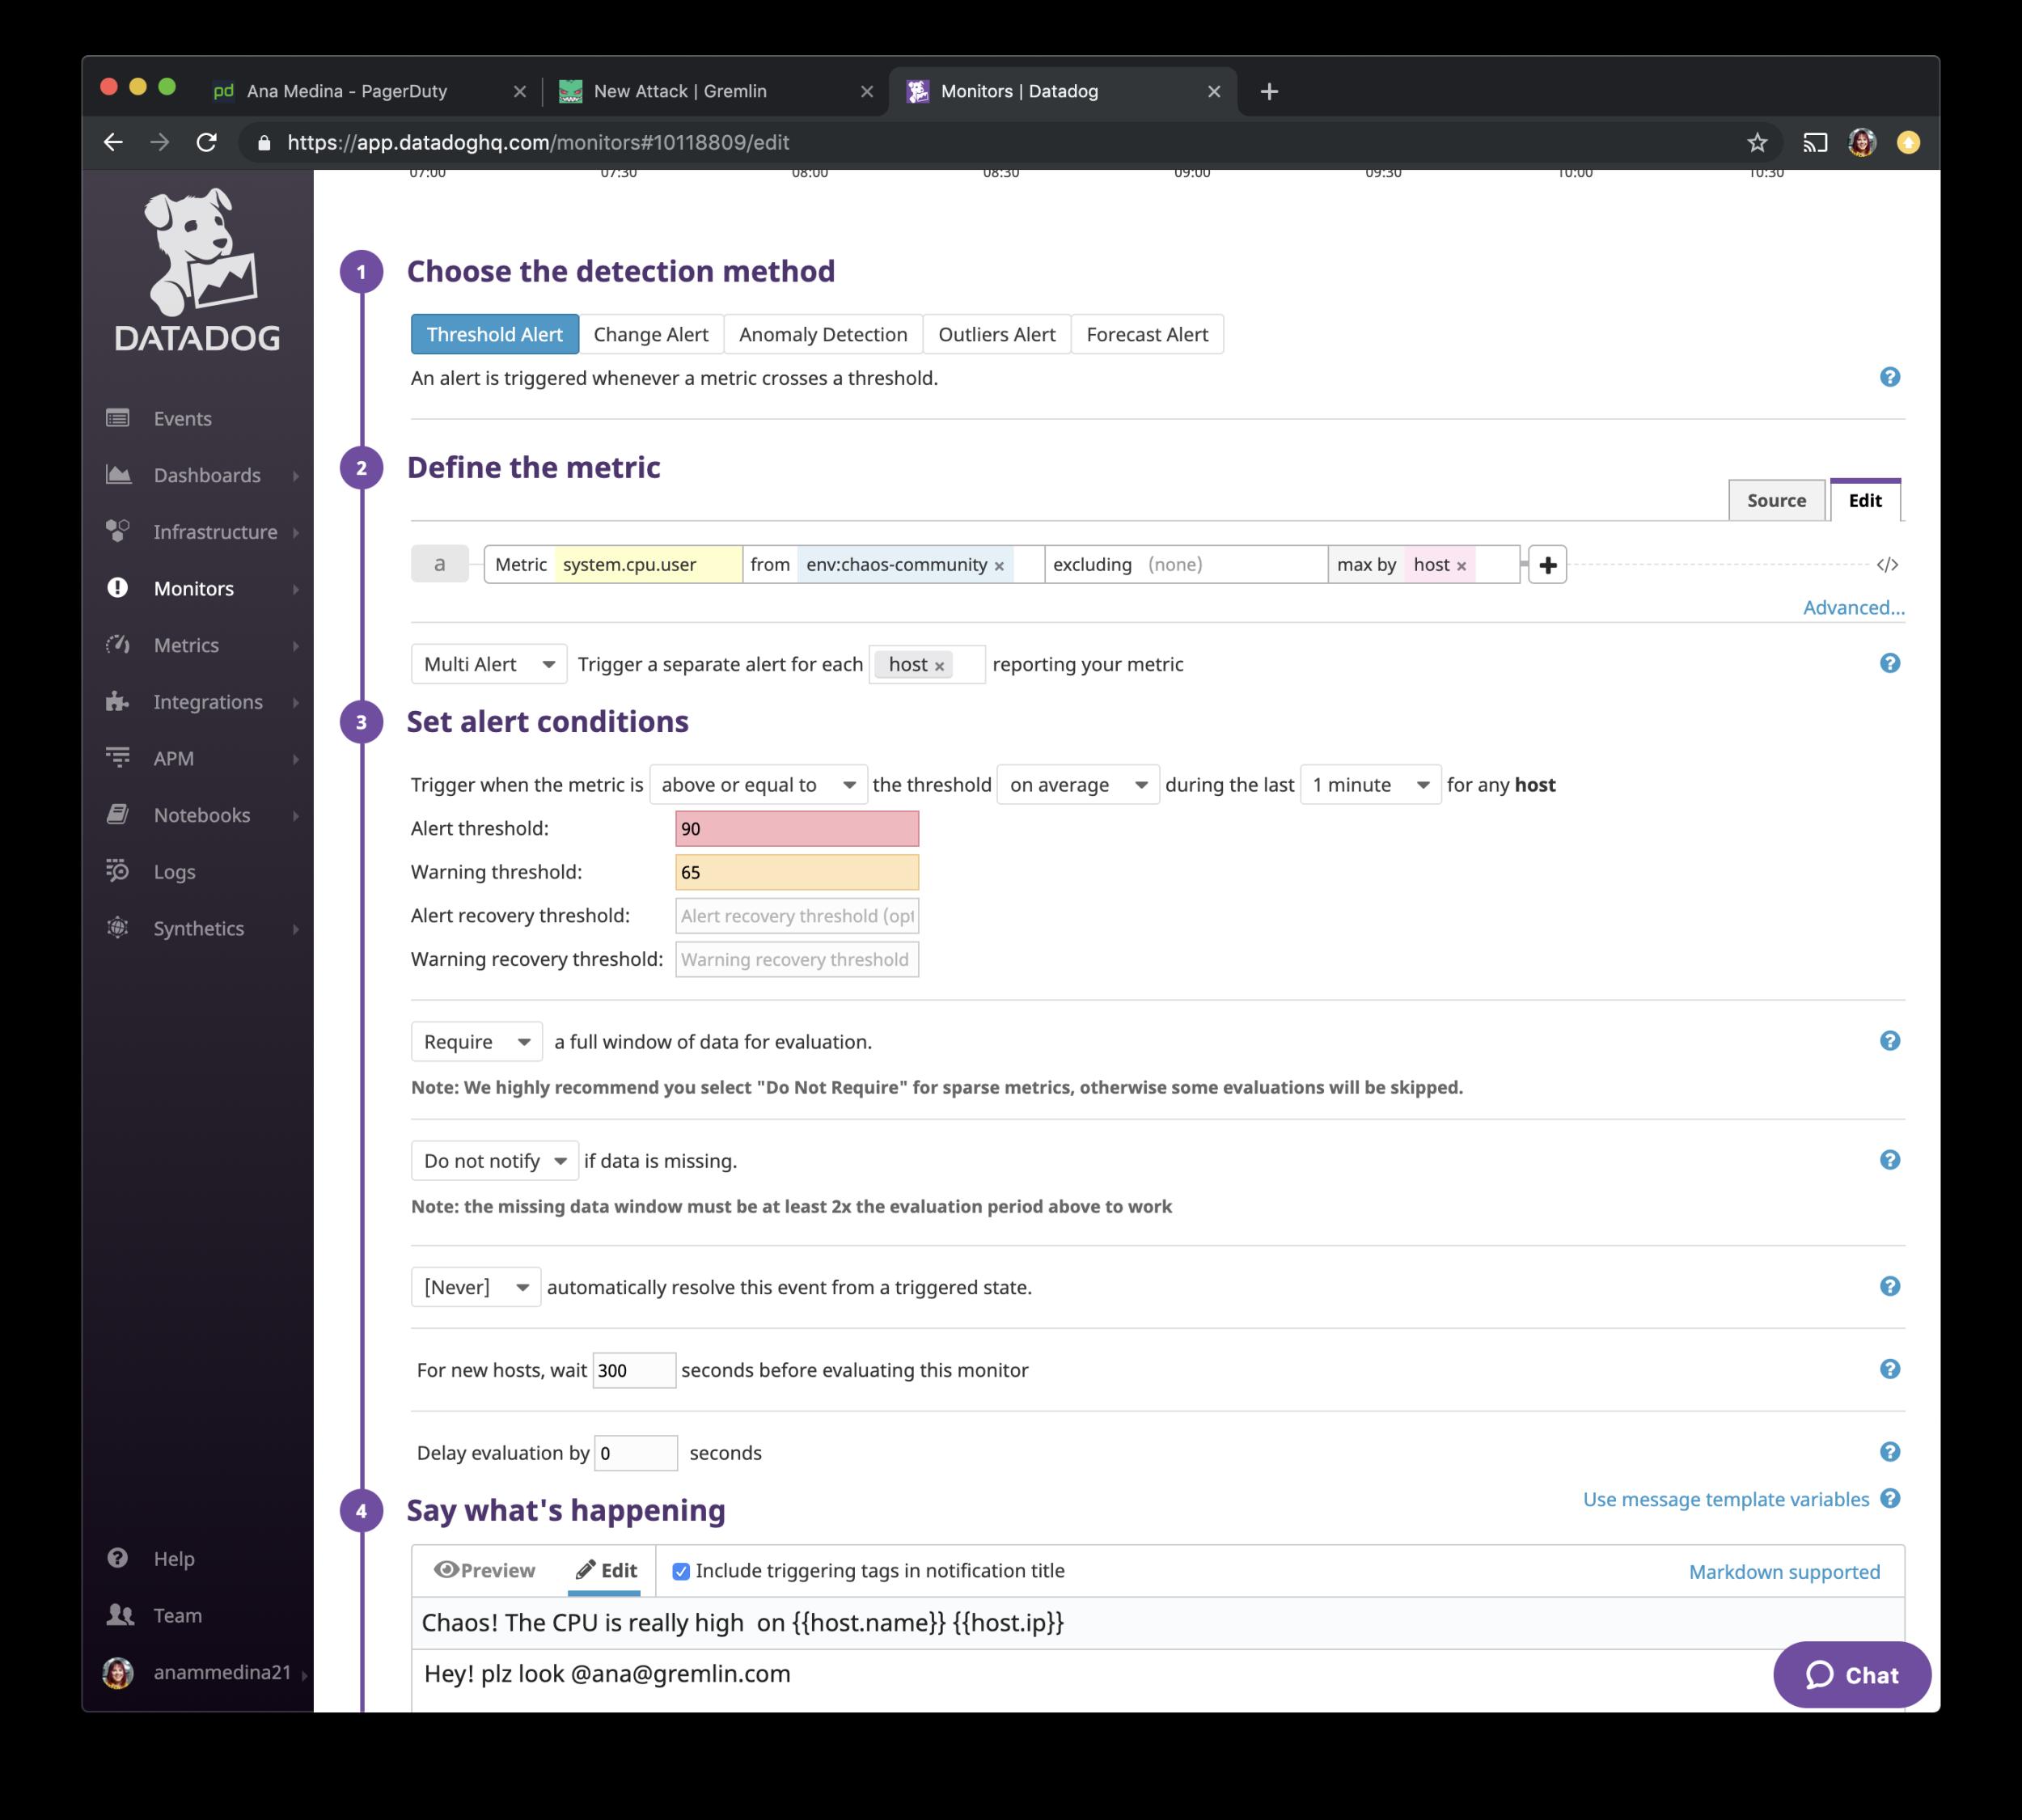 Datadog.com UI - Add Monitor Details